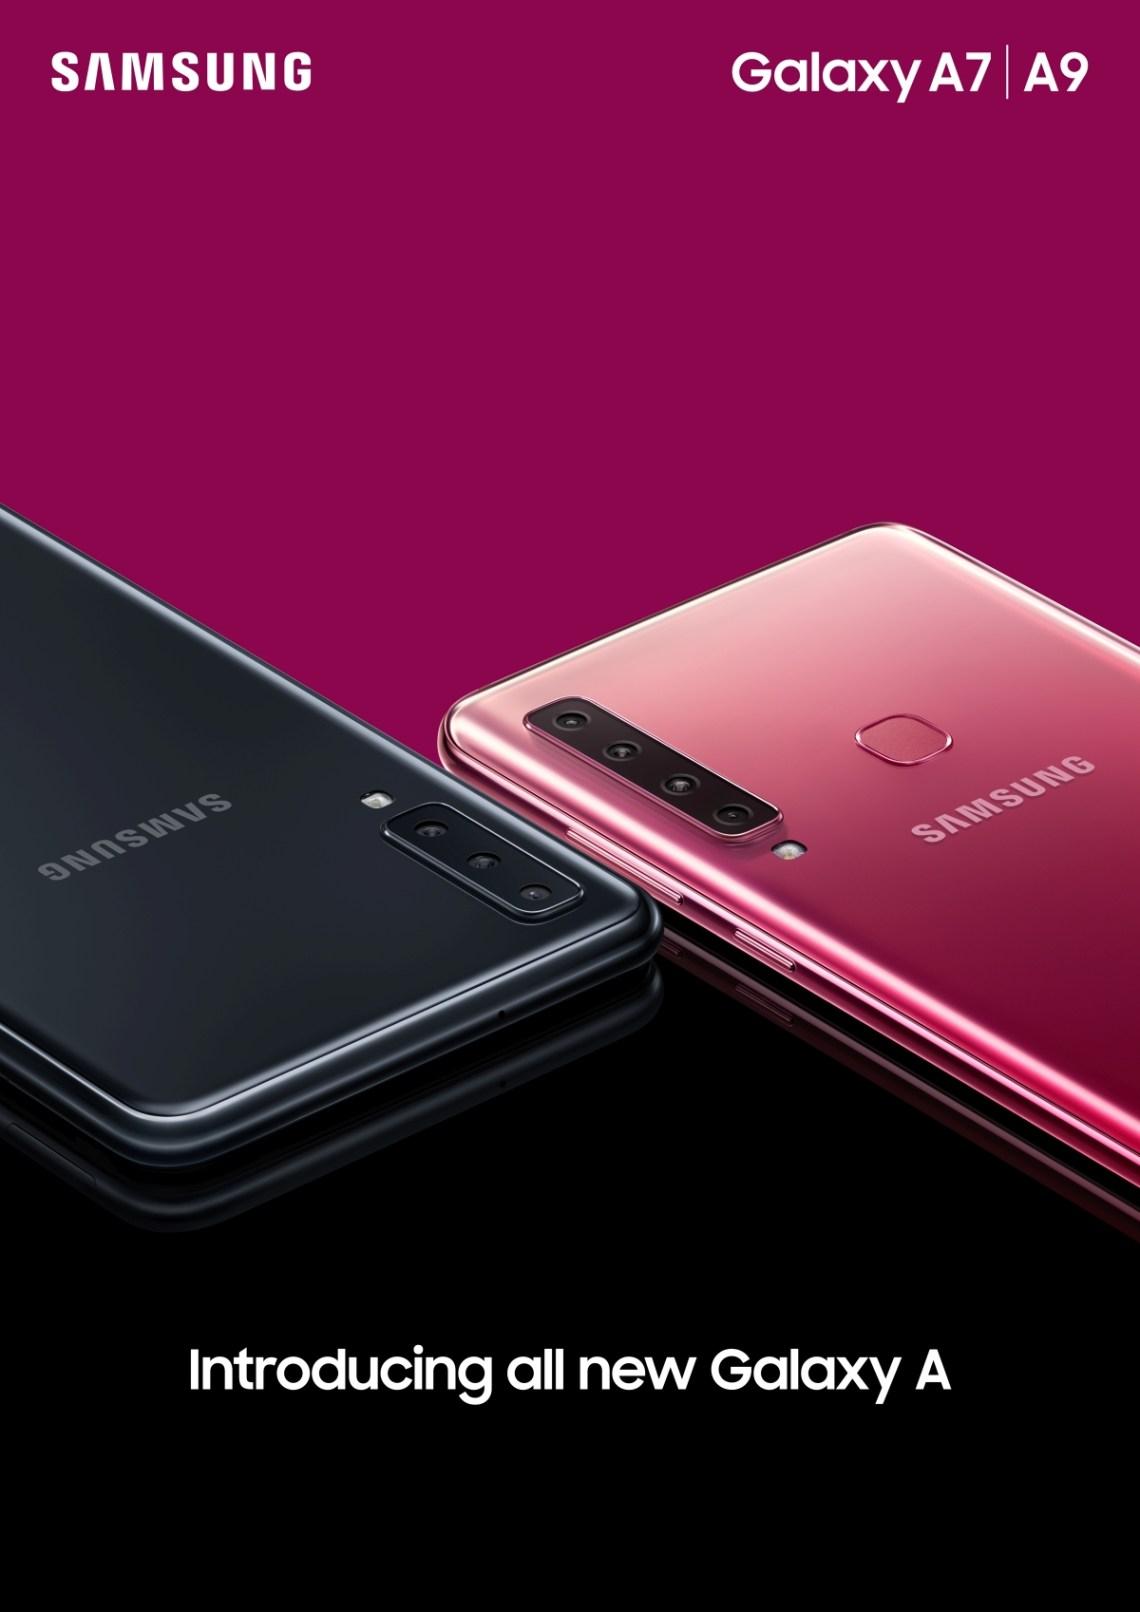 Galaxy A7_Black_A9_Bubblegum Pink_Combo